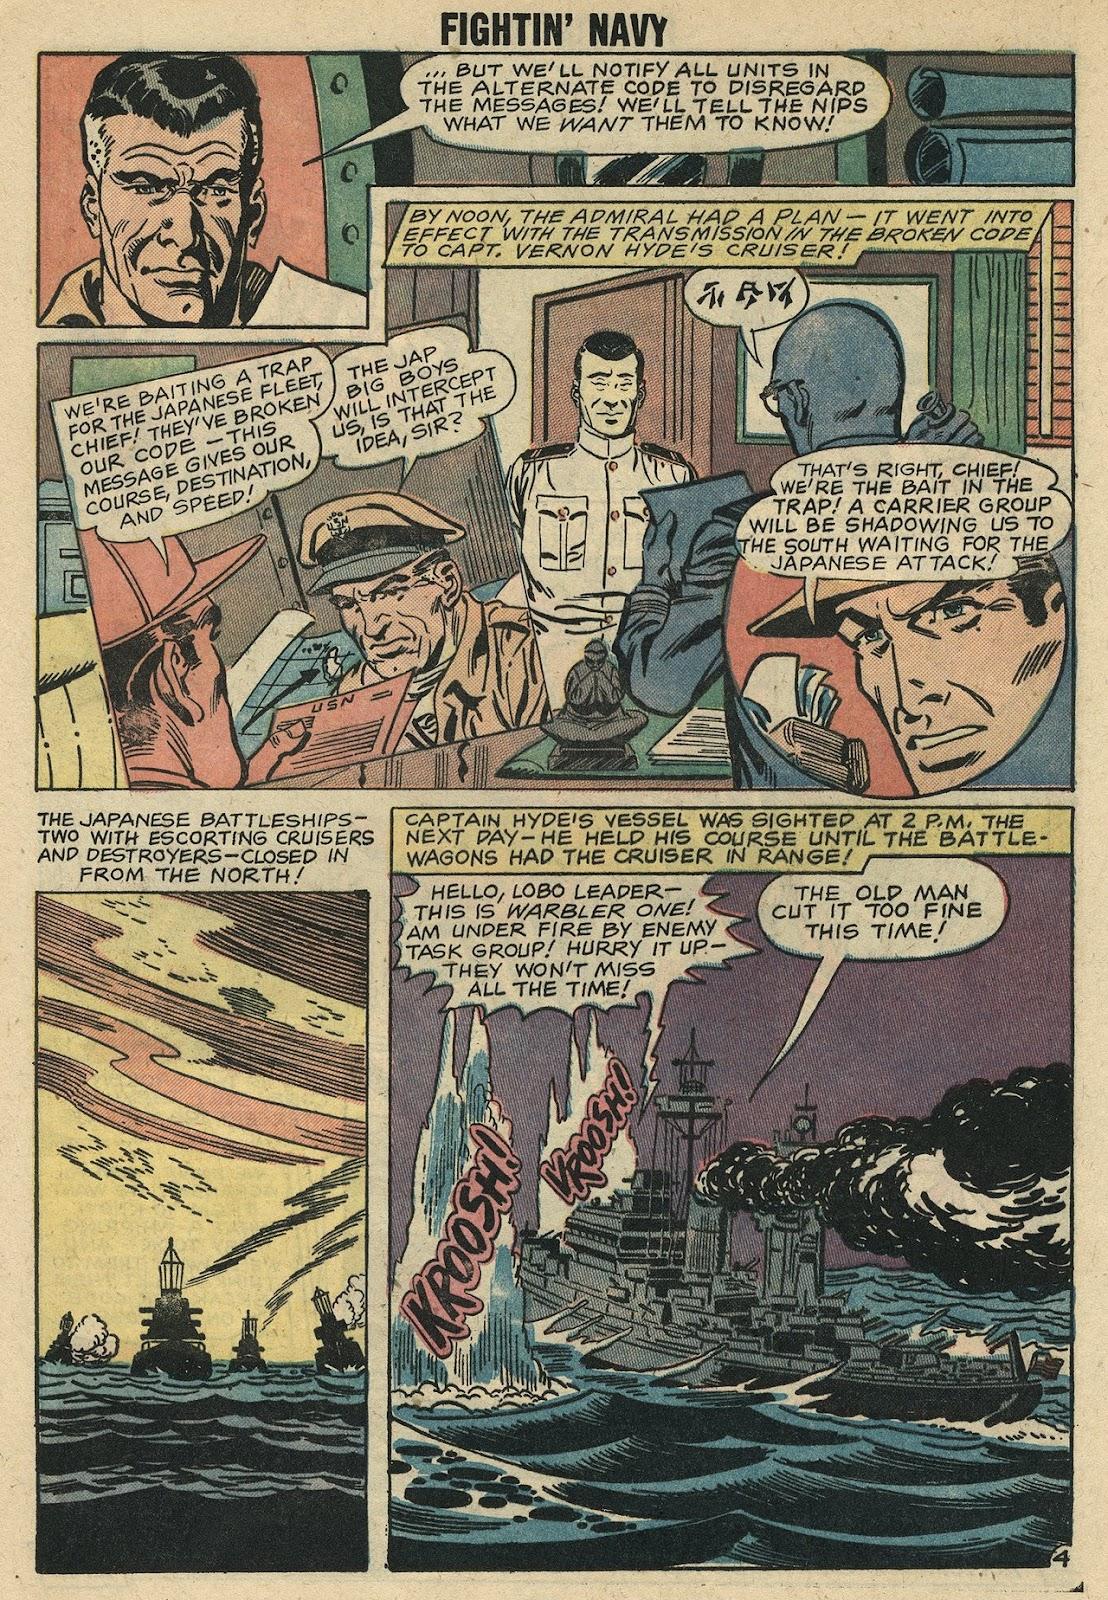 Read online Fightin' Navy comic -  Issue #86 - 24